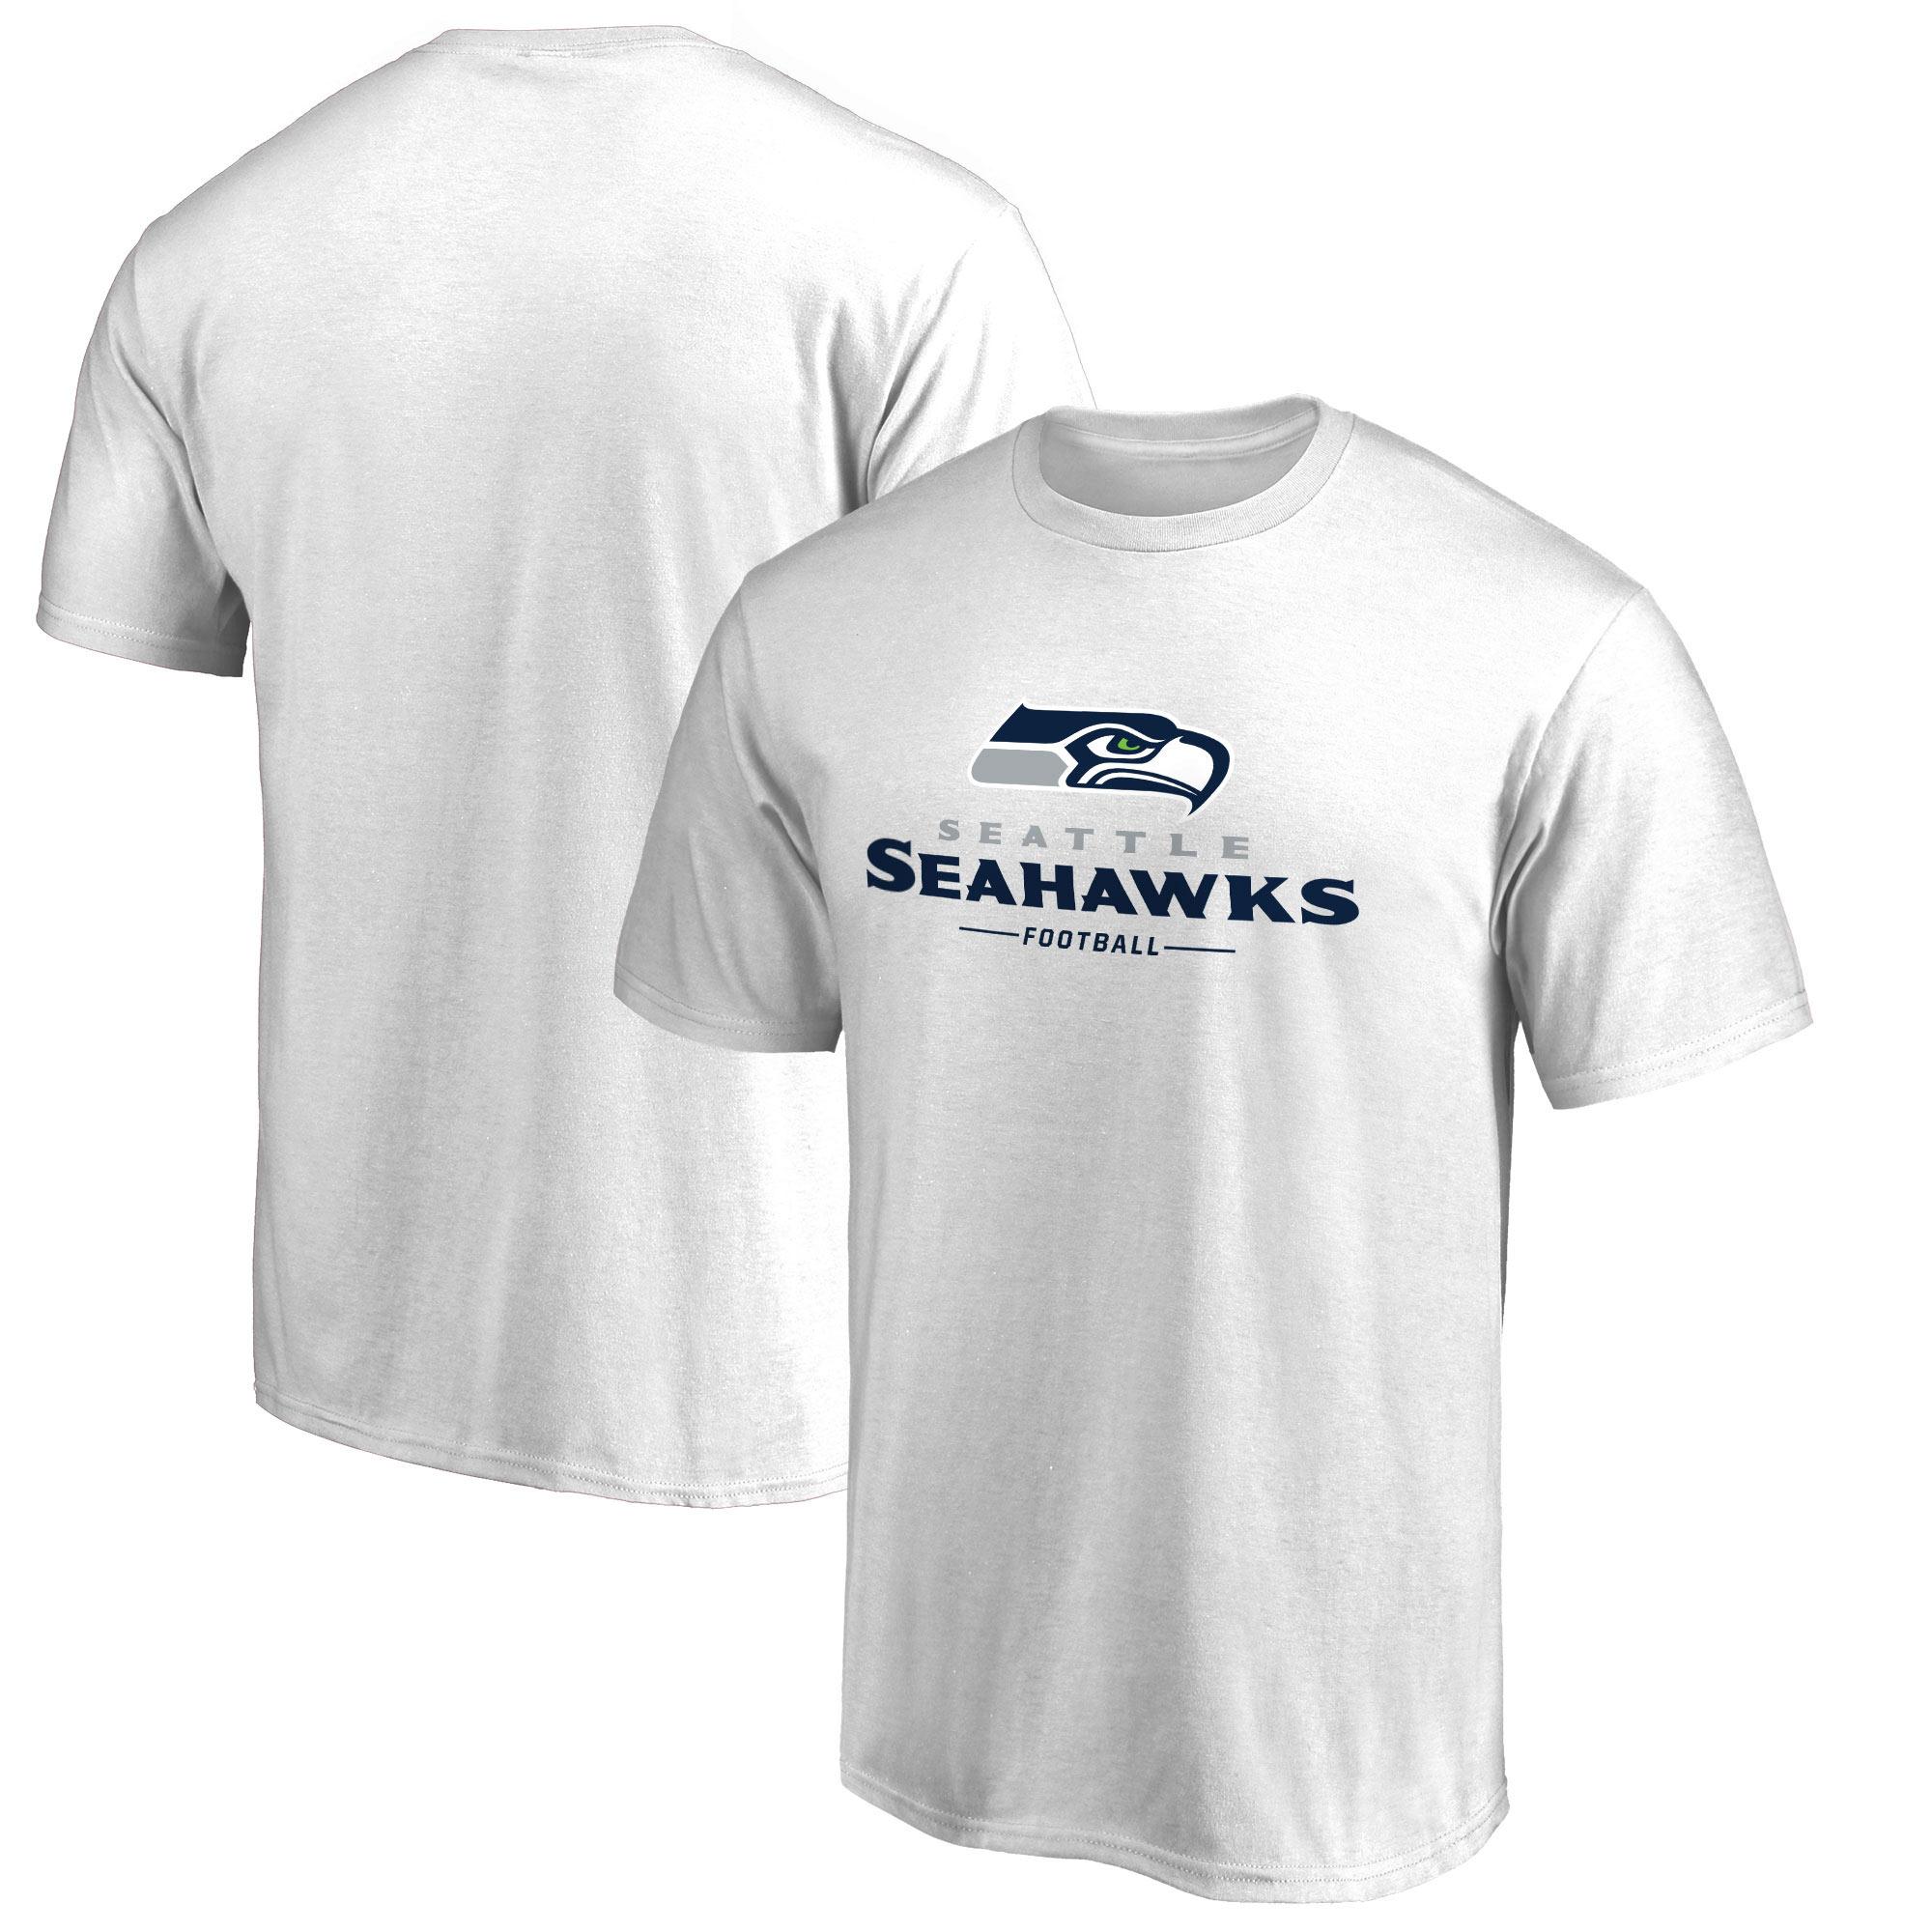 Seattle Seahawks NFL Pro Line by Fanatics Branded Team Lockup T-Shirt - White